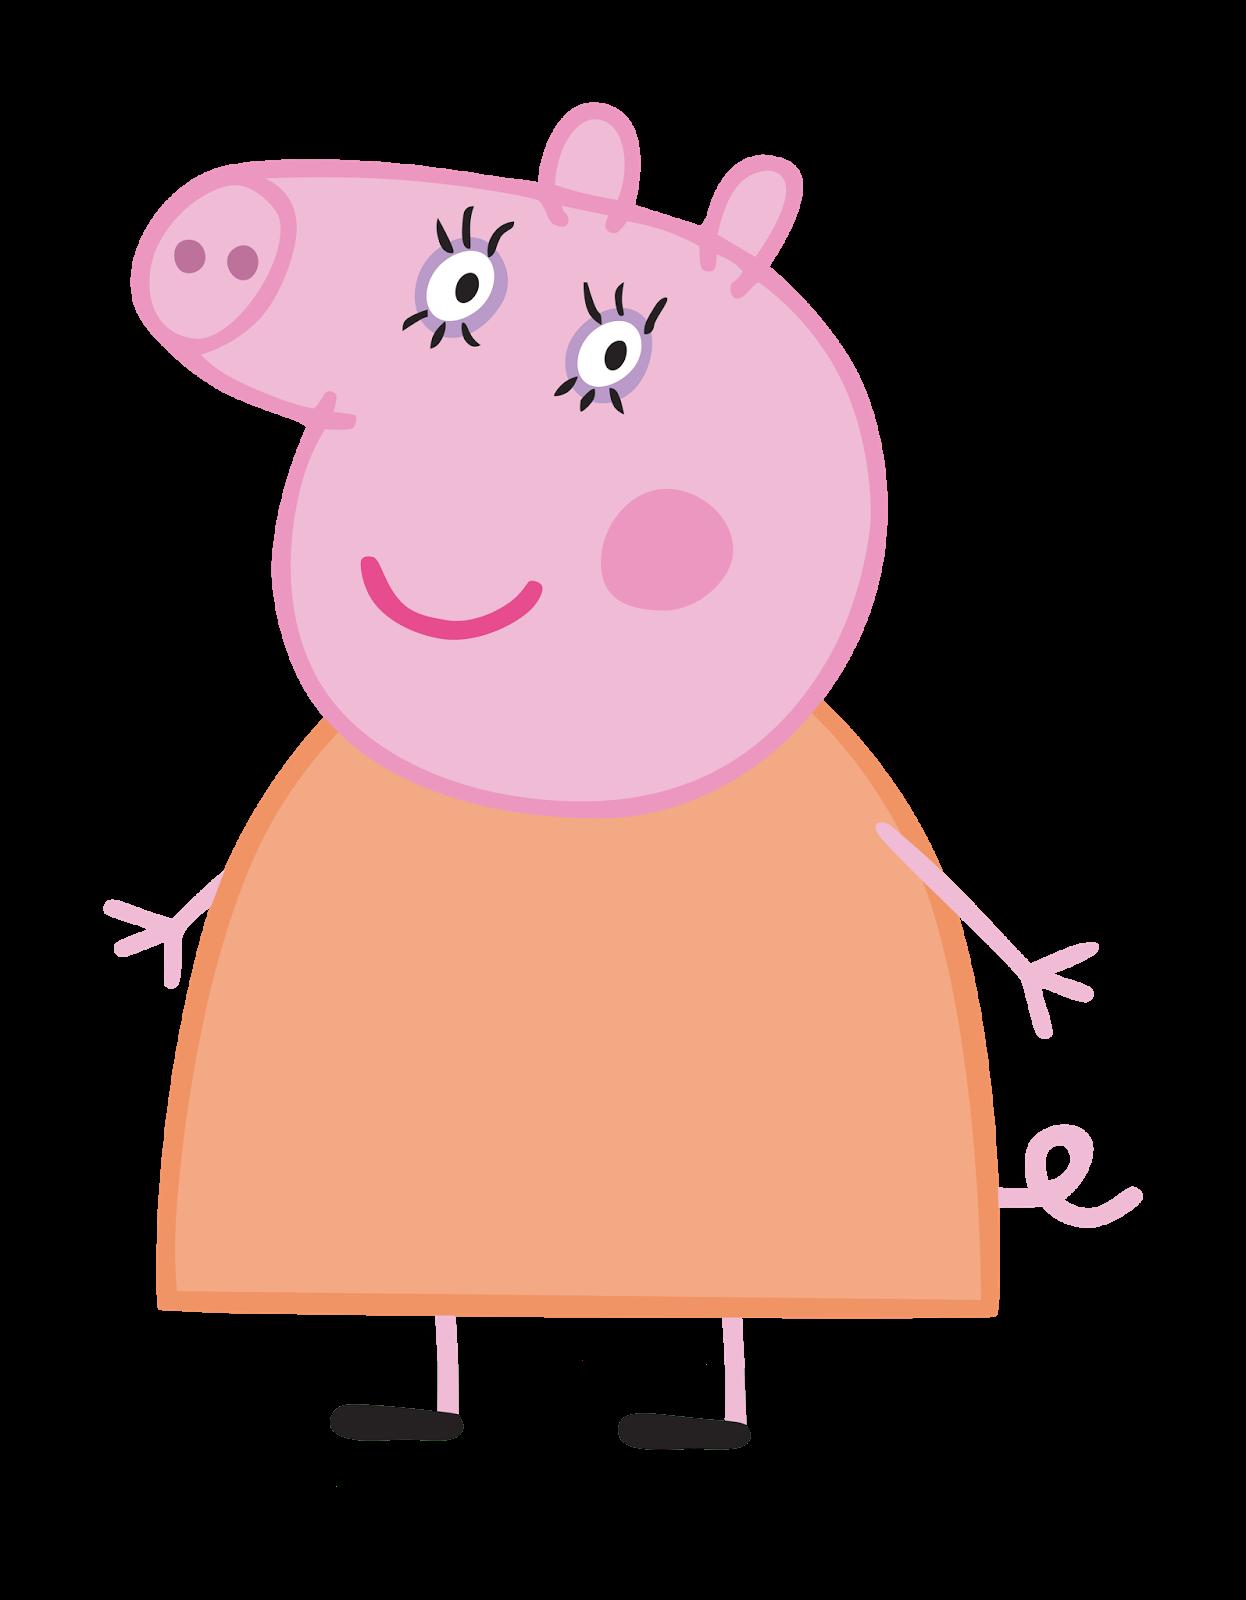 Cartoon Characters: Peppa Pig (PNG HQ)